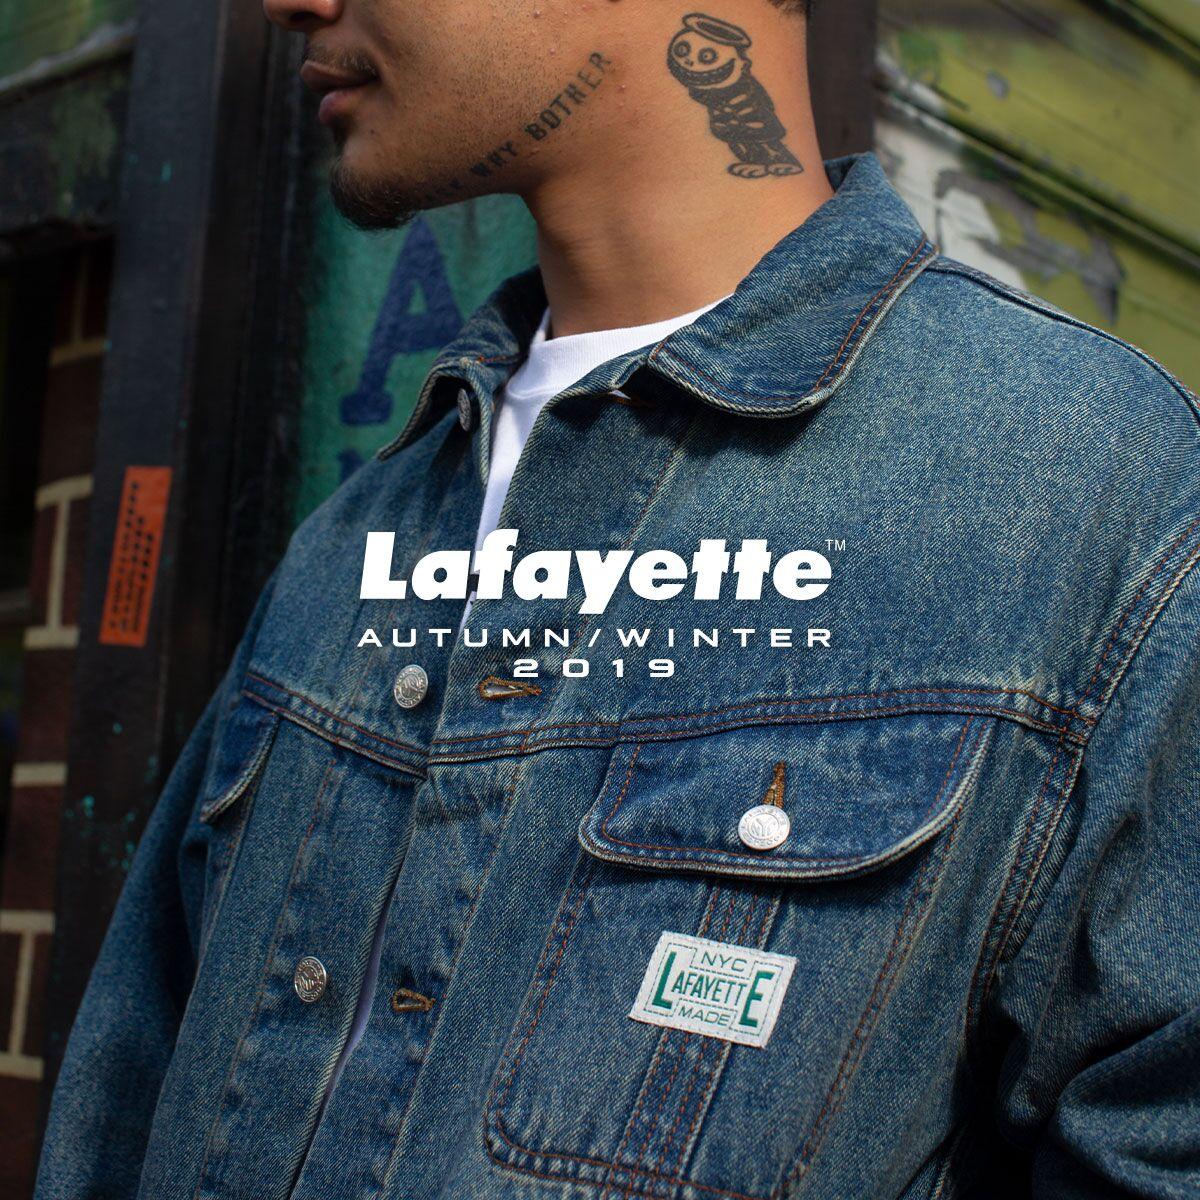 lafayette_2019_aw